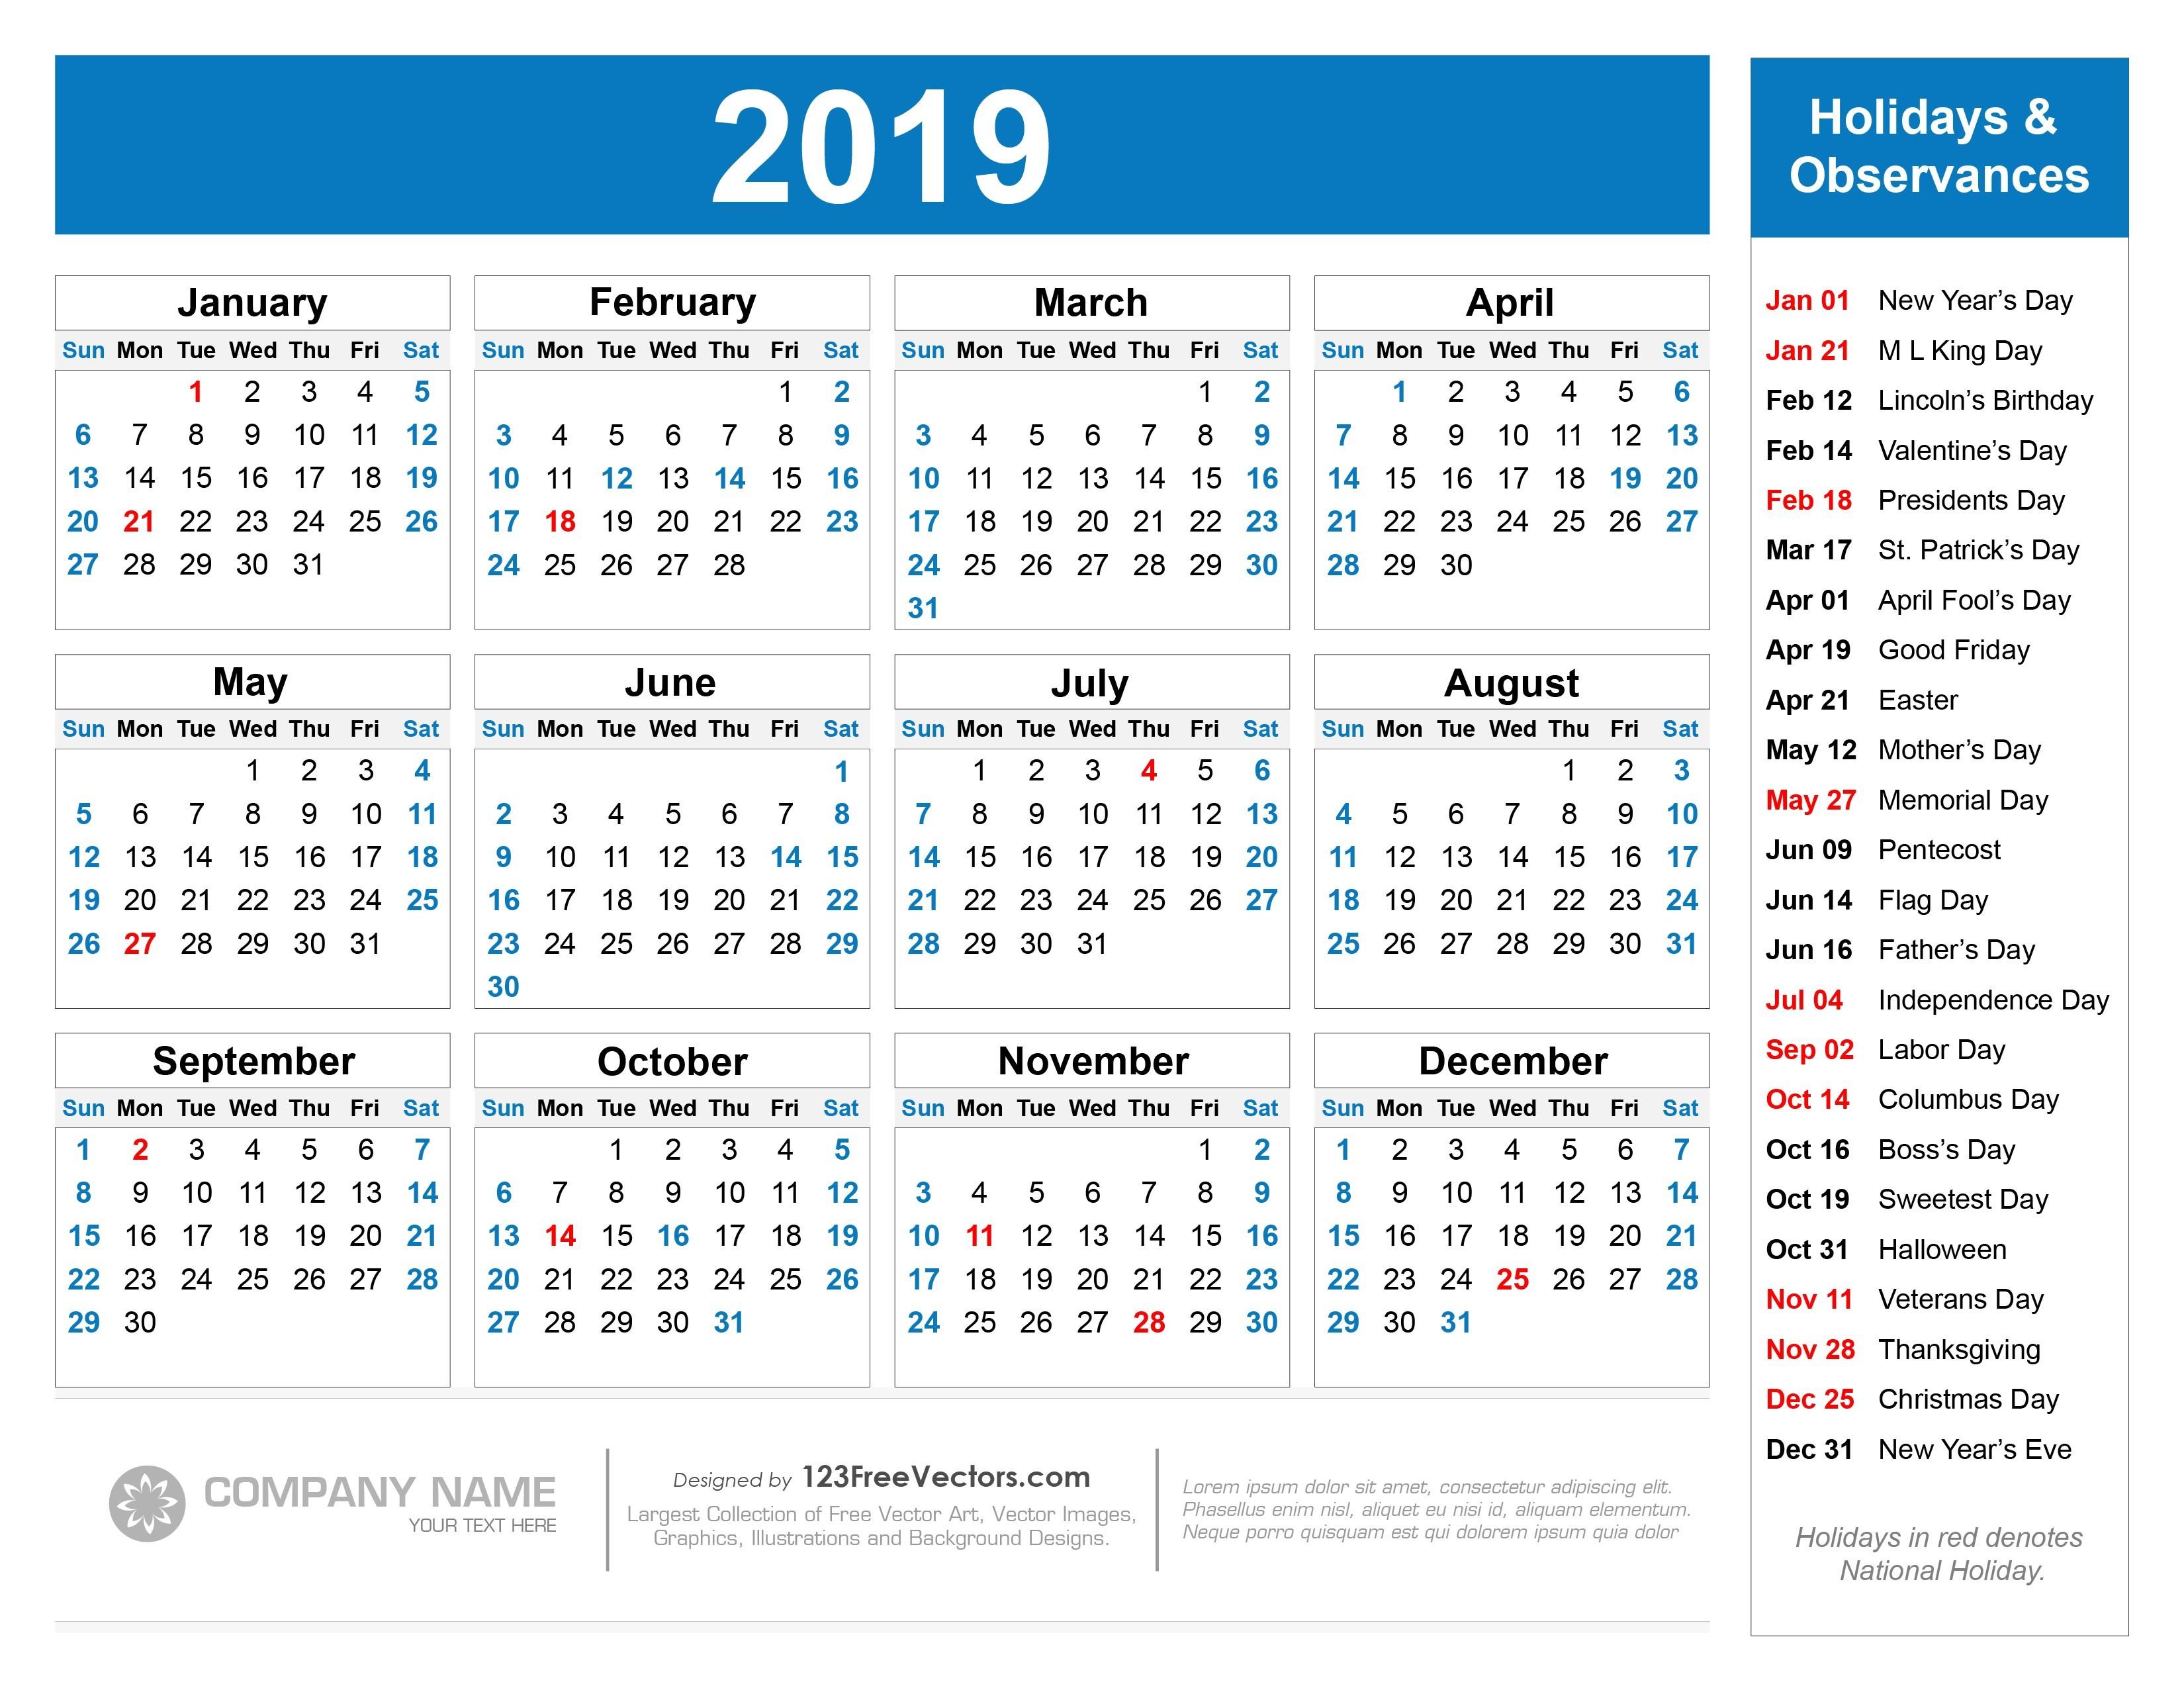 2019 Calendar Holidays Printable Free Printable 2019 Calendar with Holidays